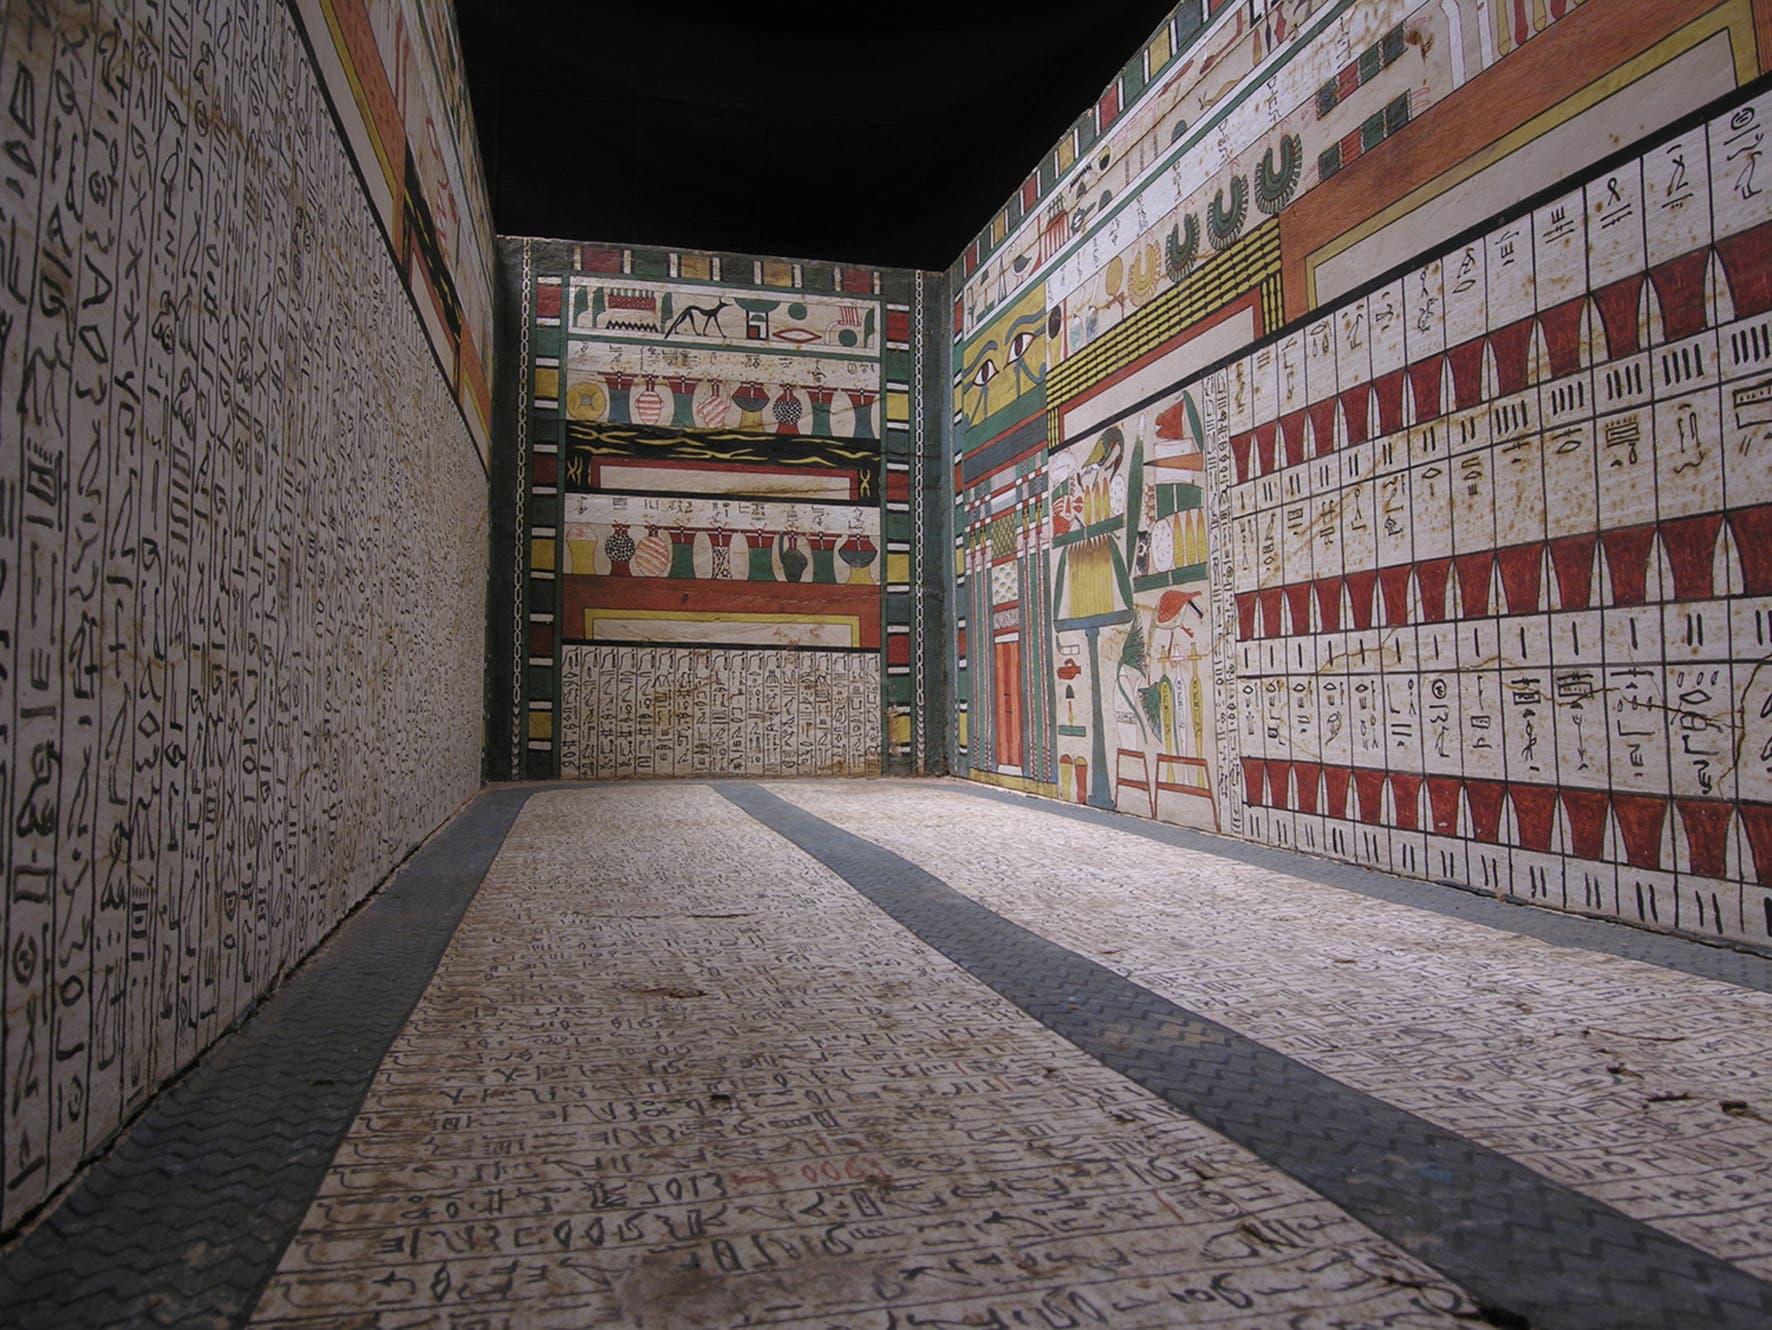 Sarkophag in Luxor